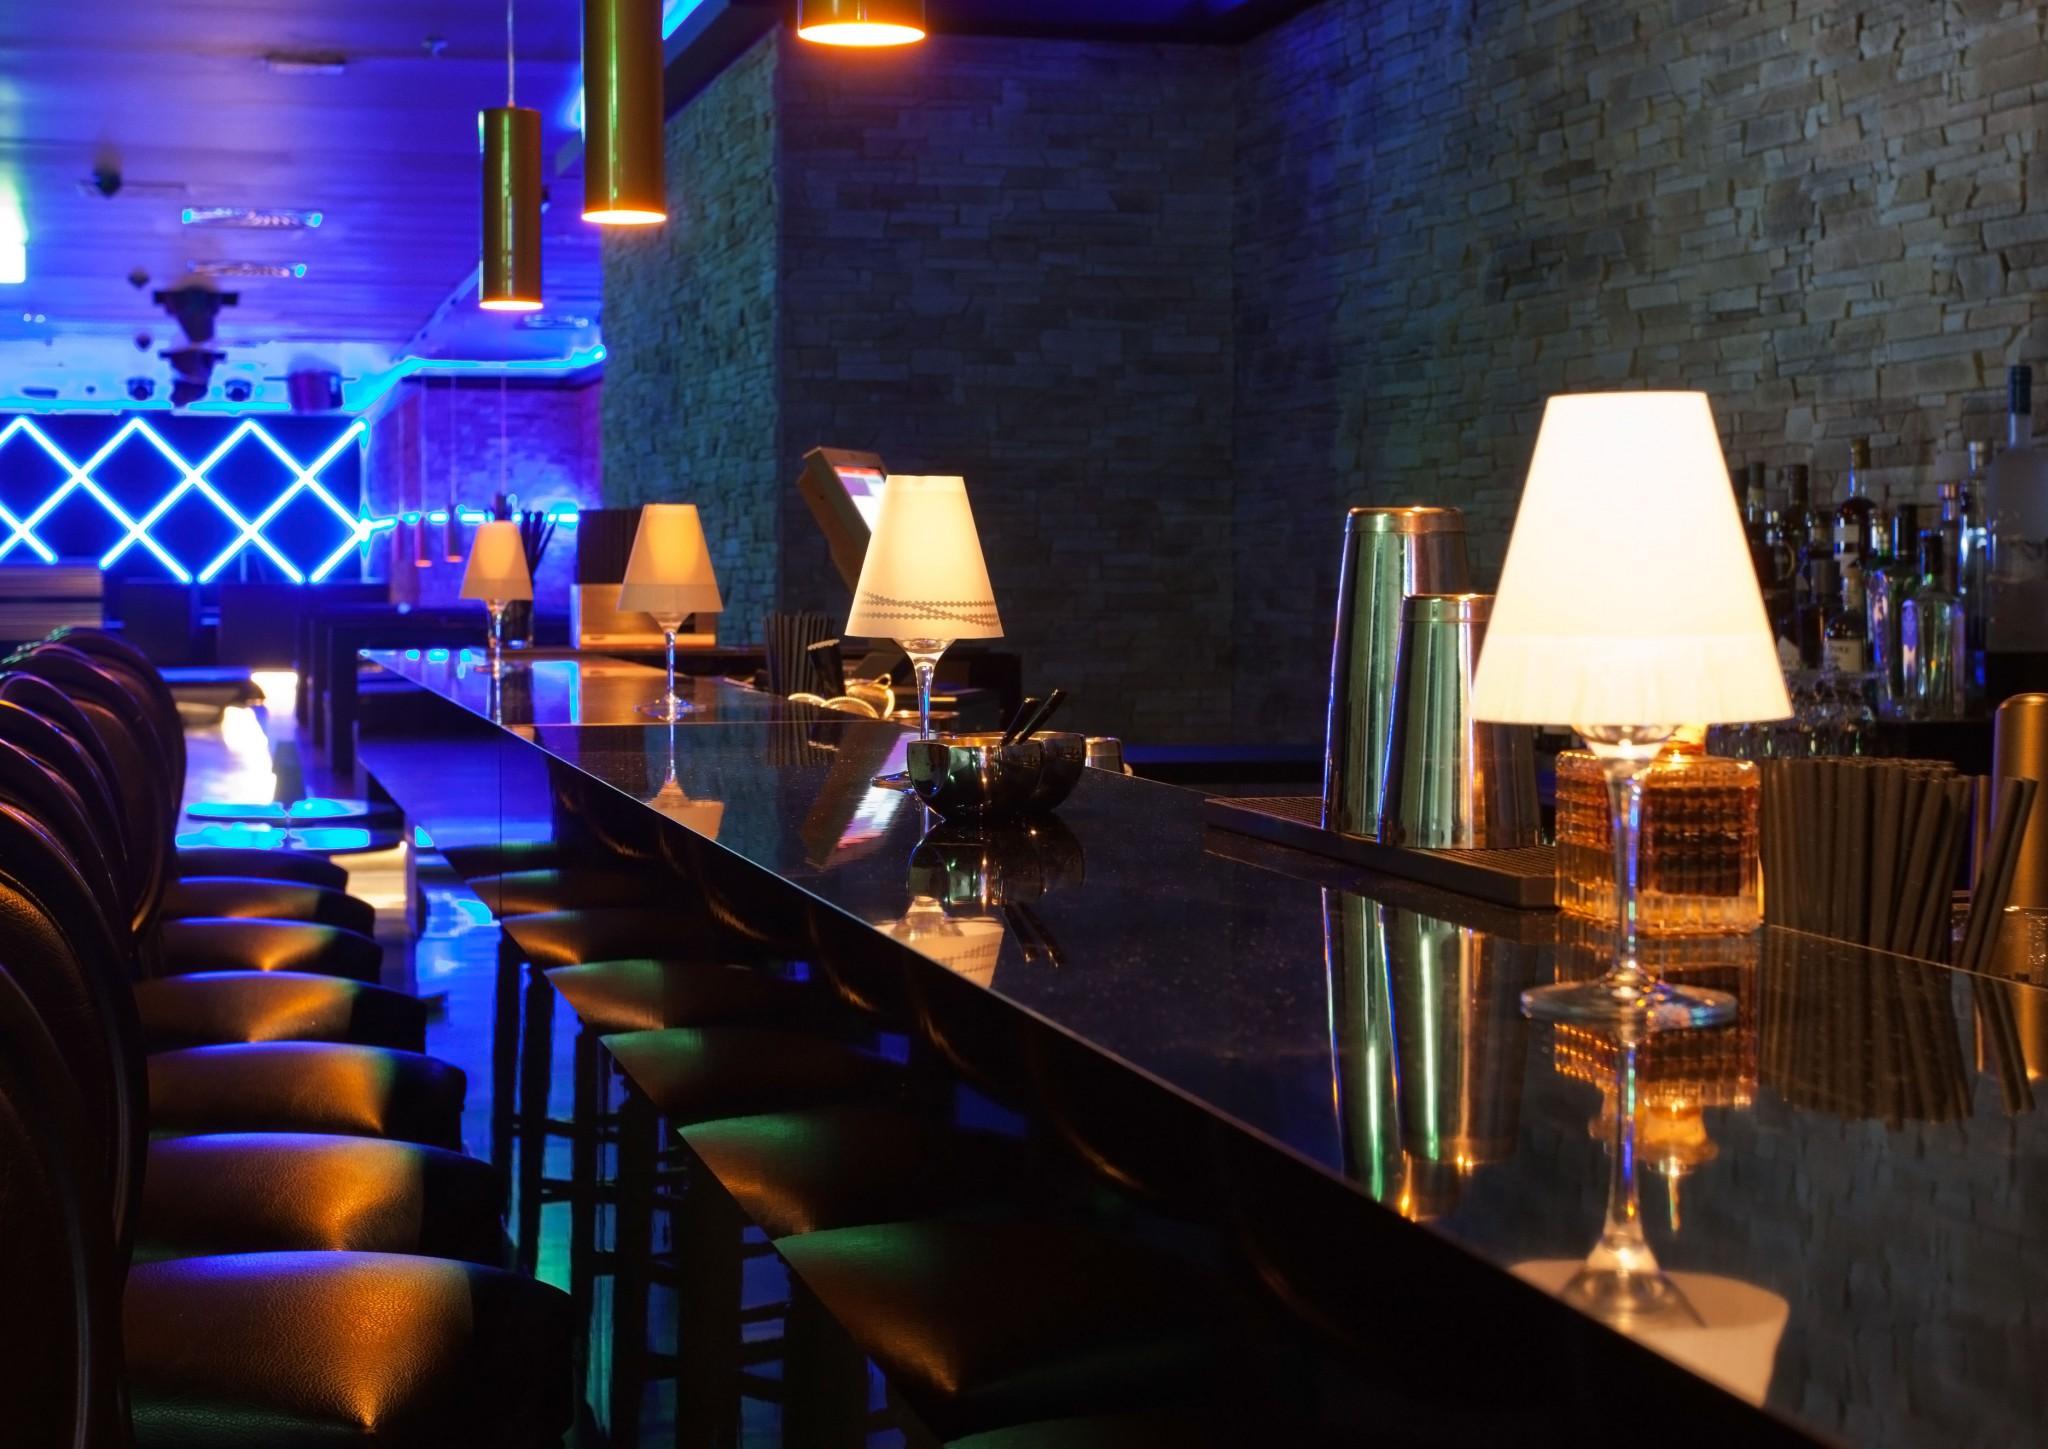 Playboy Club Interior Design Stil Manipulation 2012